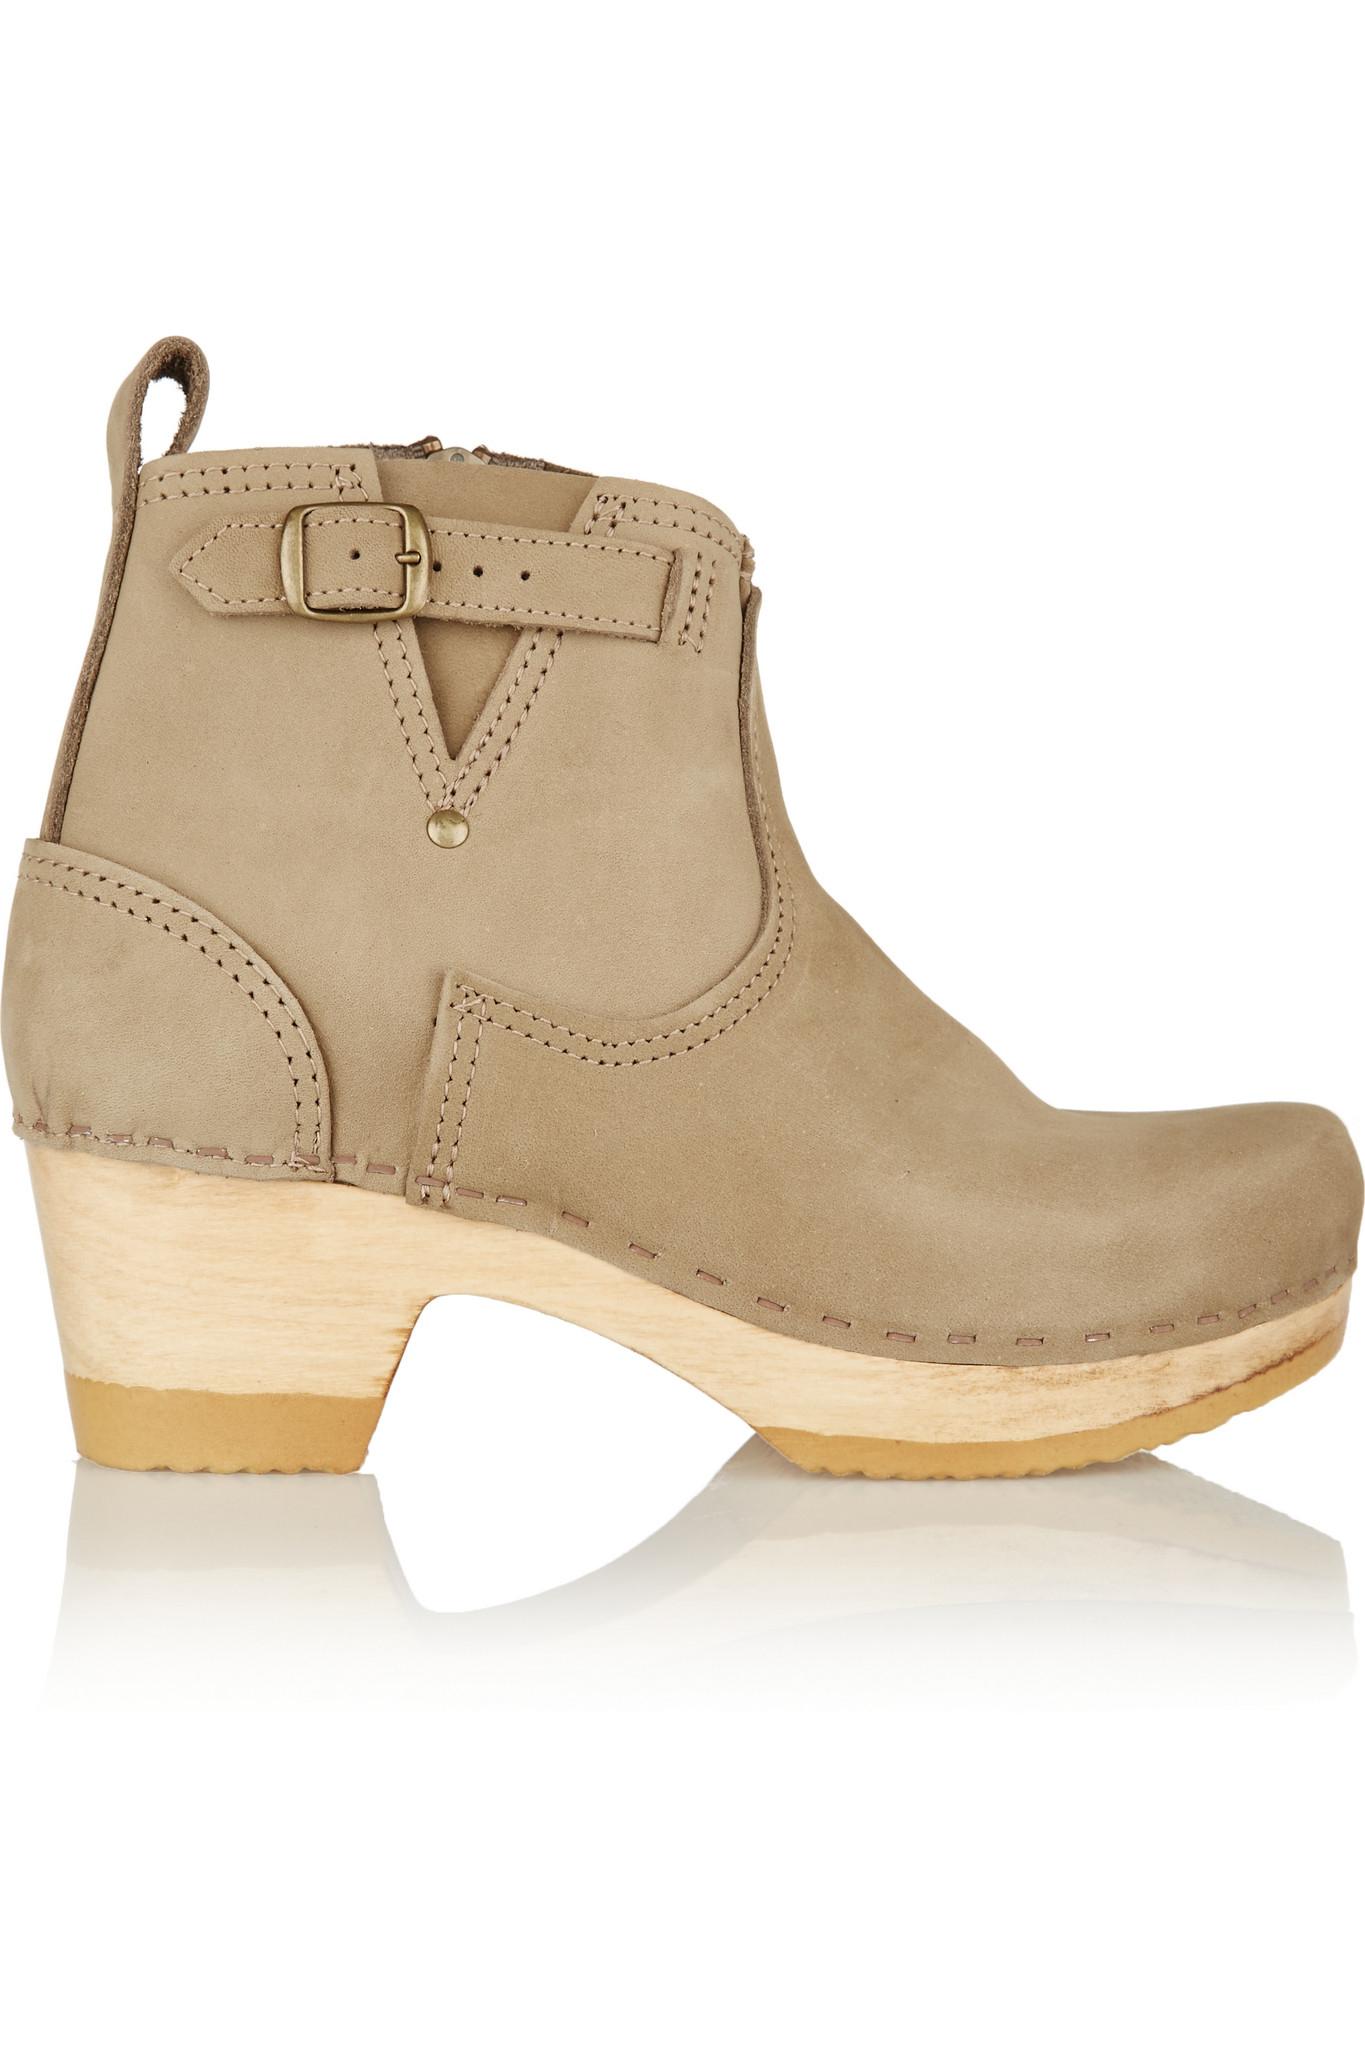 Jimmy Choo Woman Decker Leather Boots Mushroom Size 36 Jimmy Choo London Cheap Store PRvnJlt